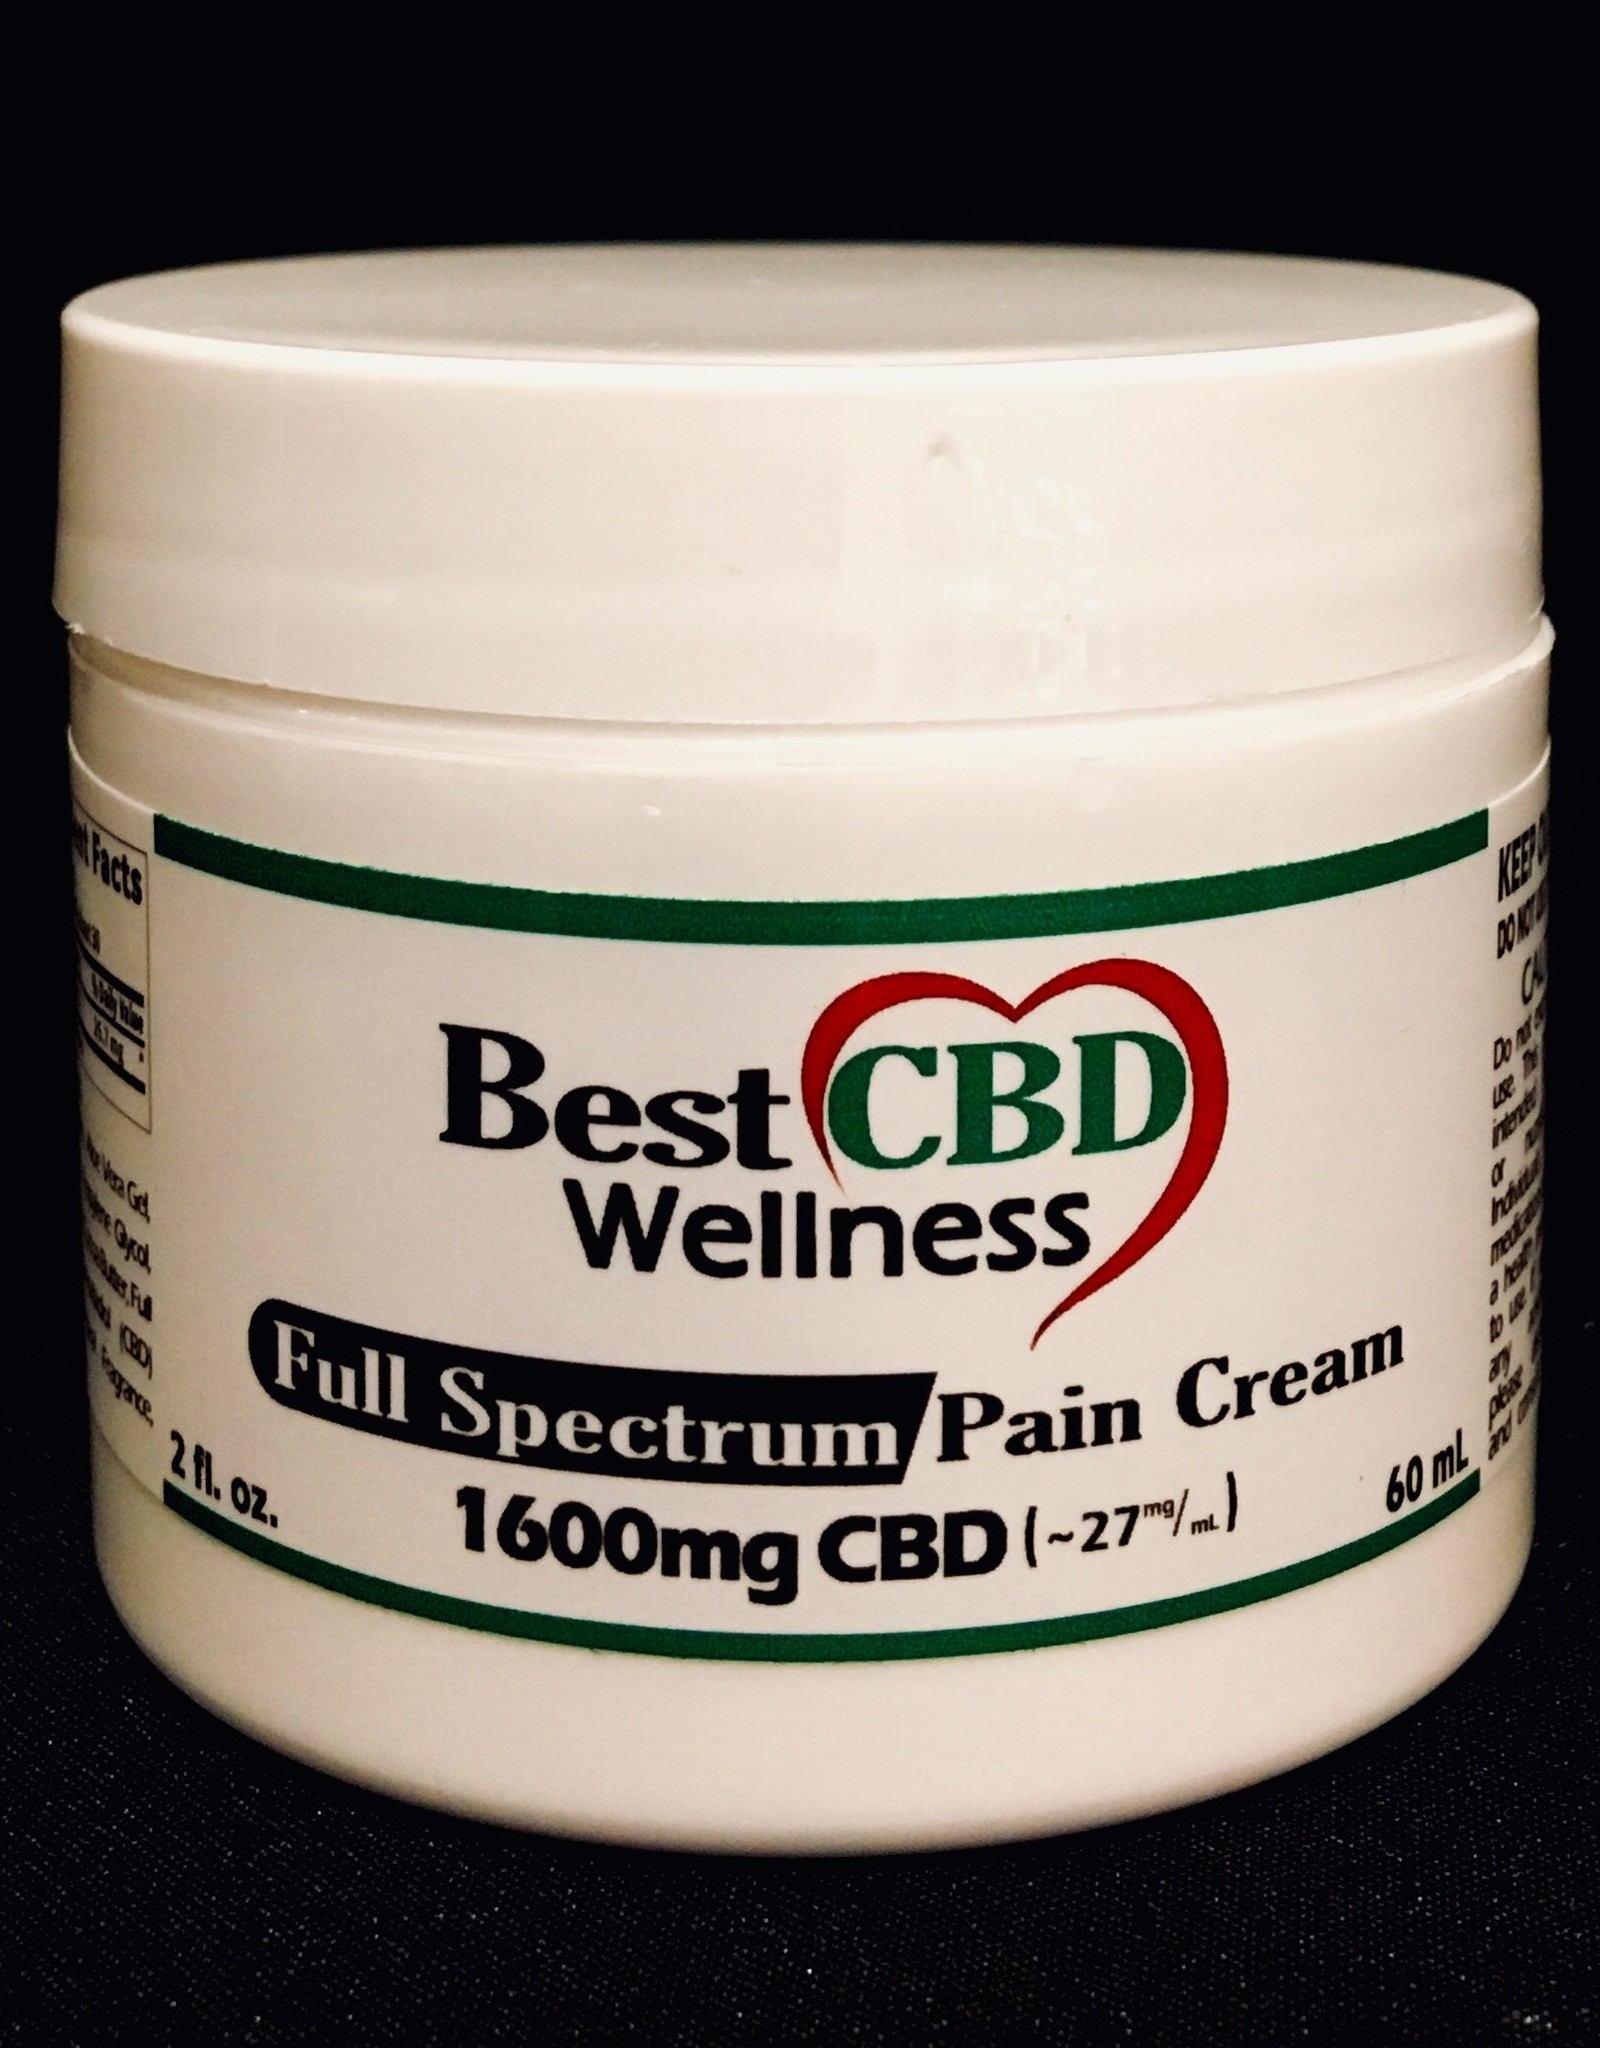 Best CBD Wellness Full Spectrum CBD Pain Cream 1600mg/27mg/ml 2oz